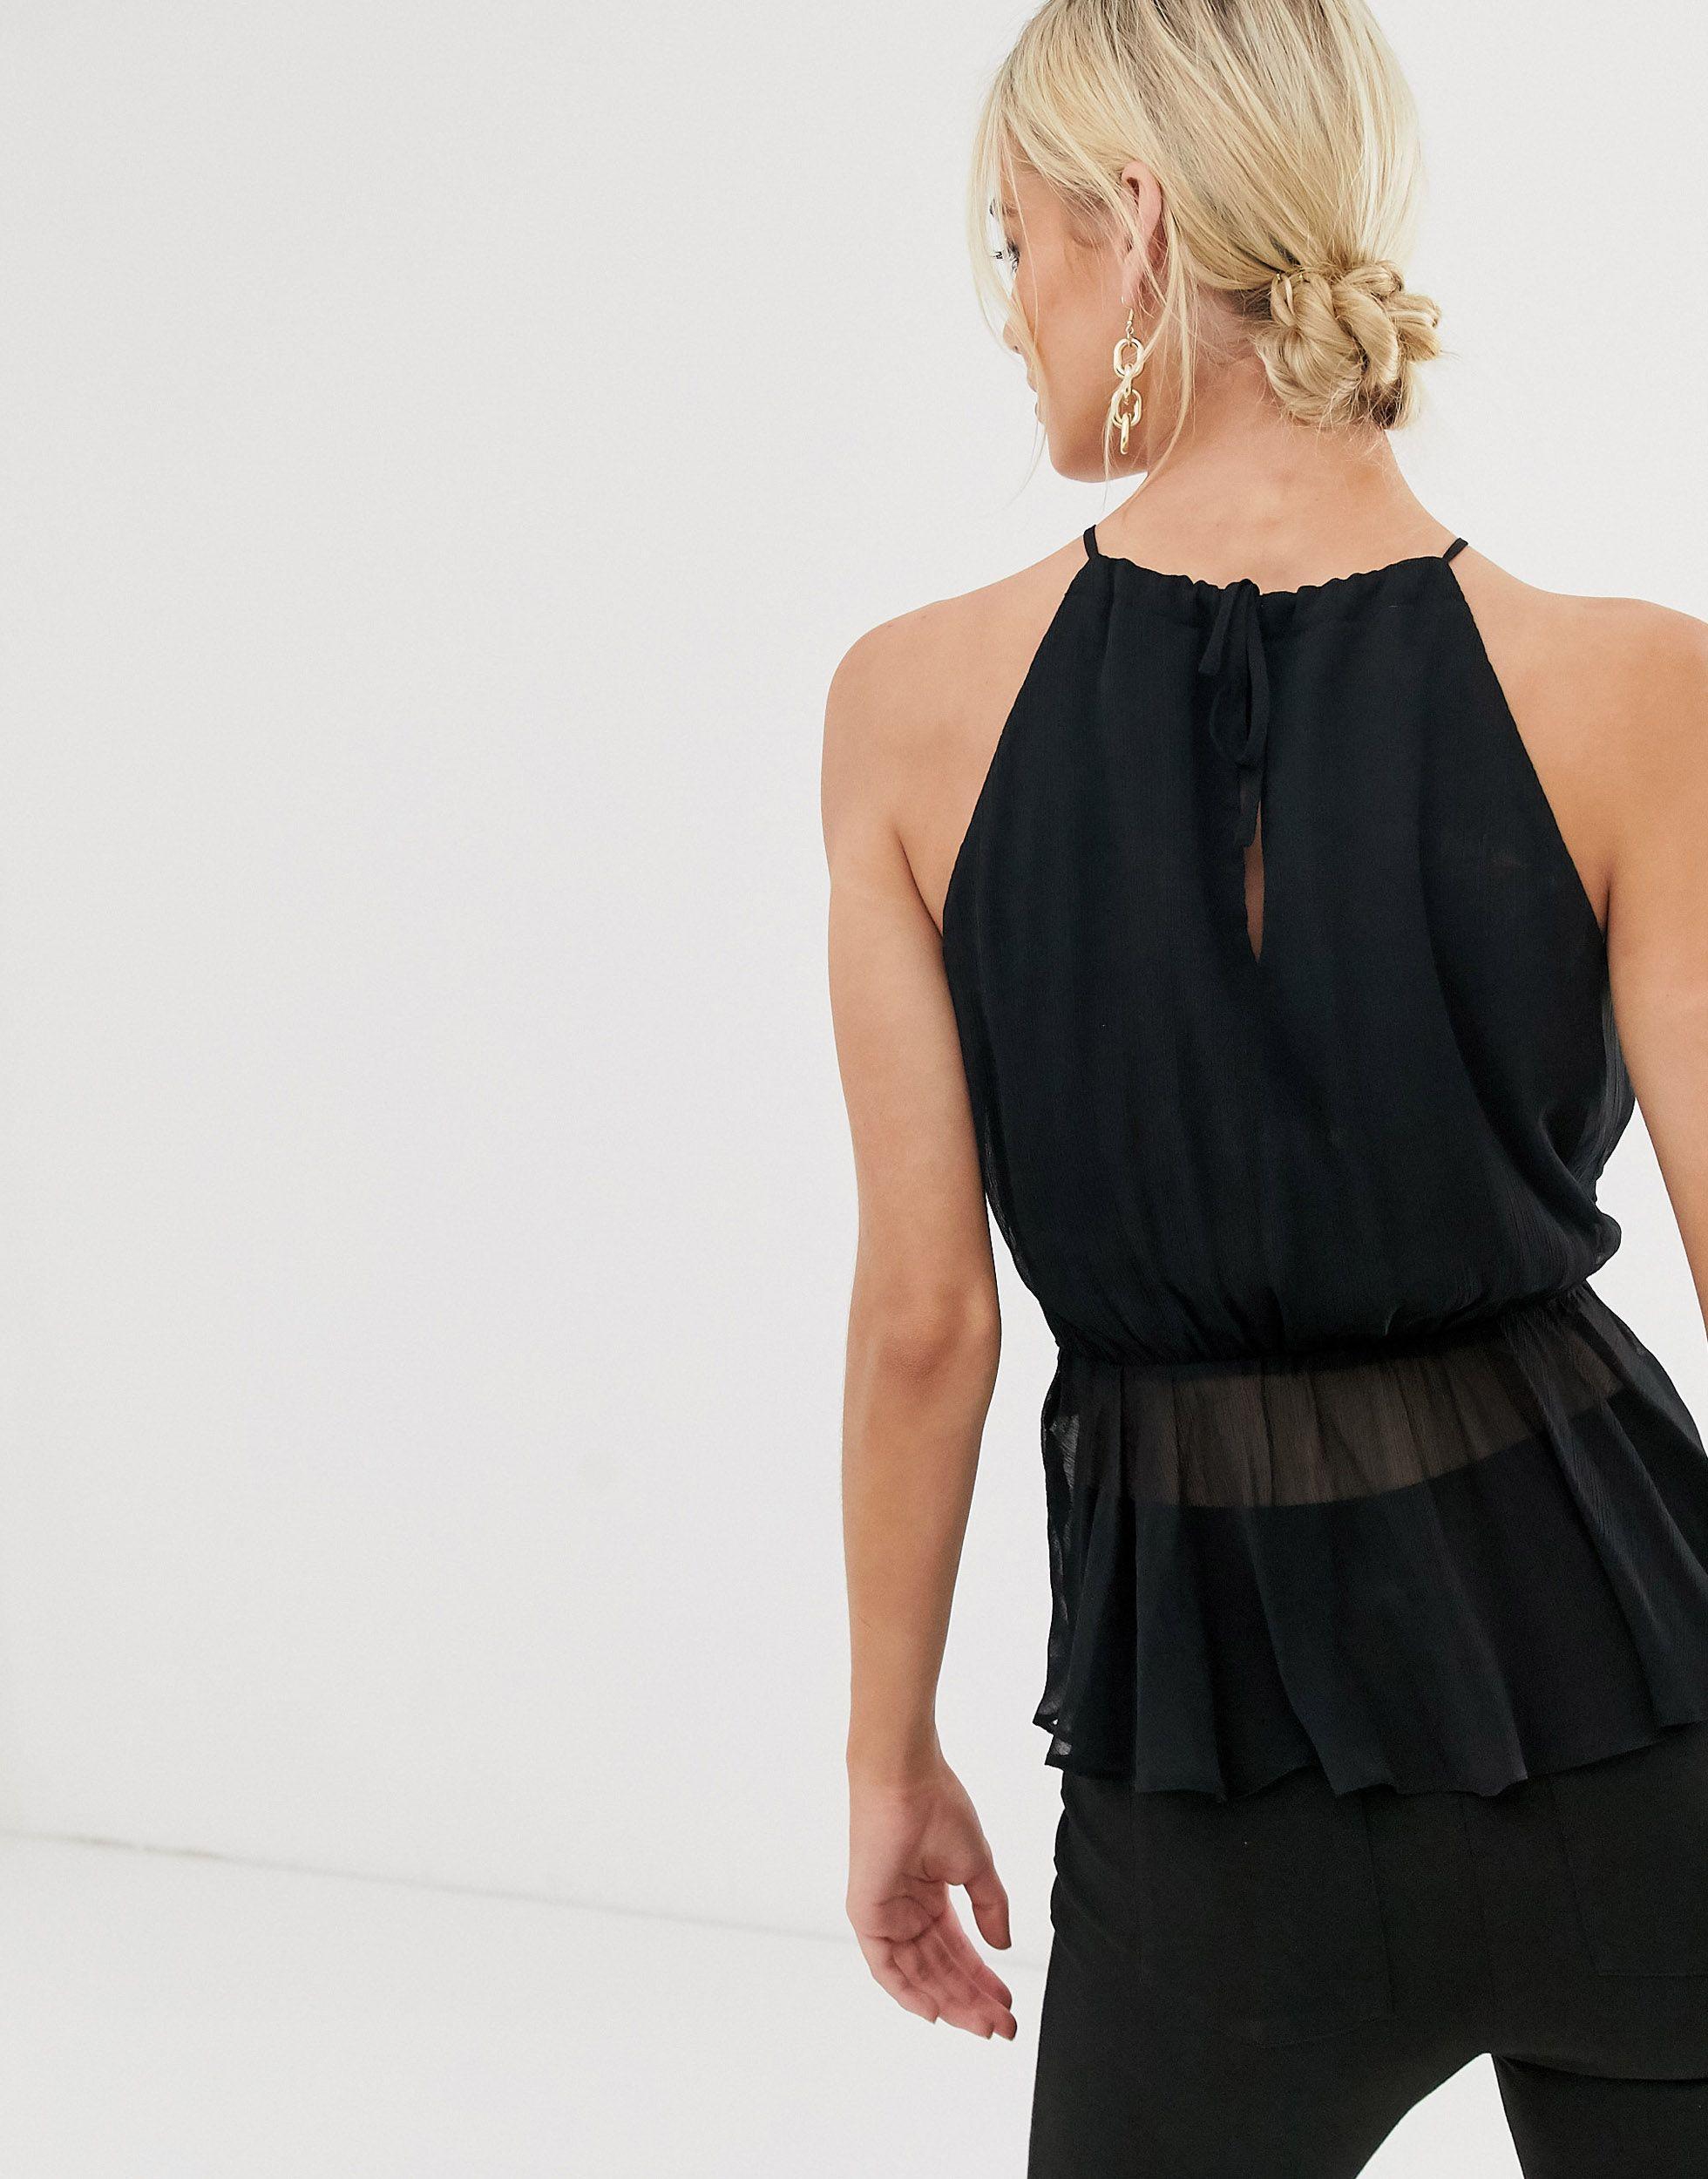 ASOS DESGIN - Top dos nu sans manches avec ceinture Synthétique ASOS en coloris Noir